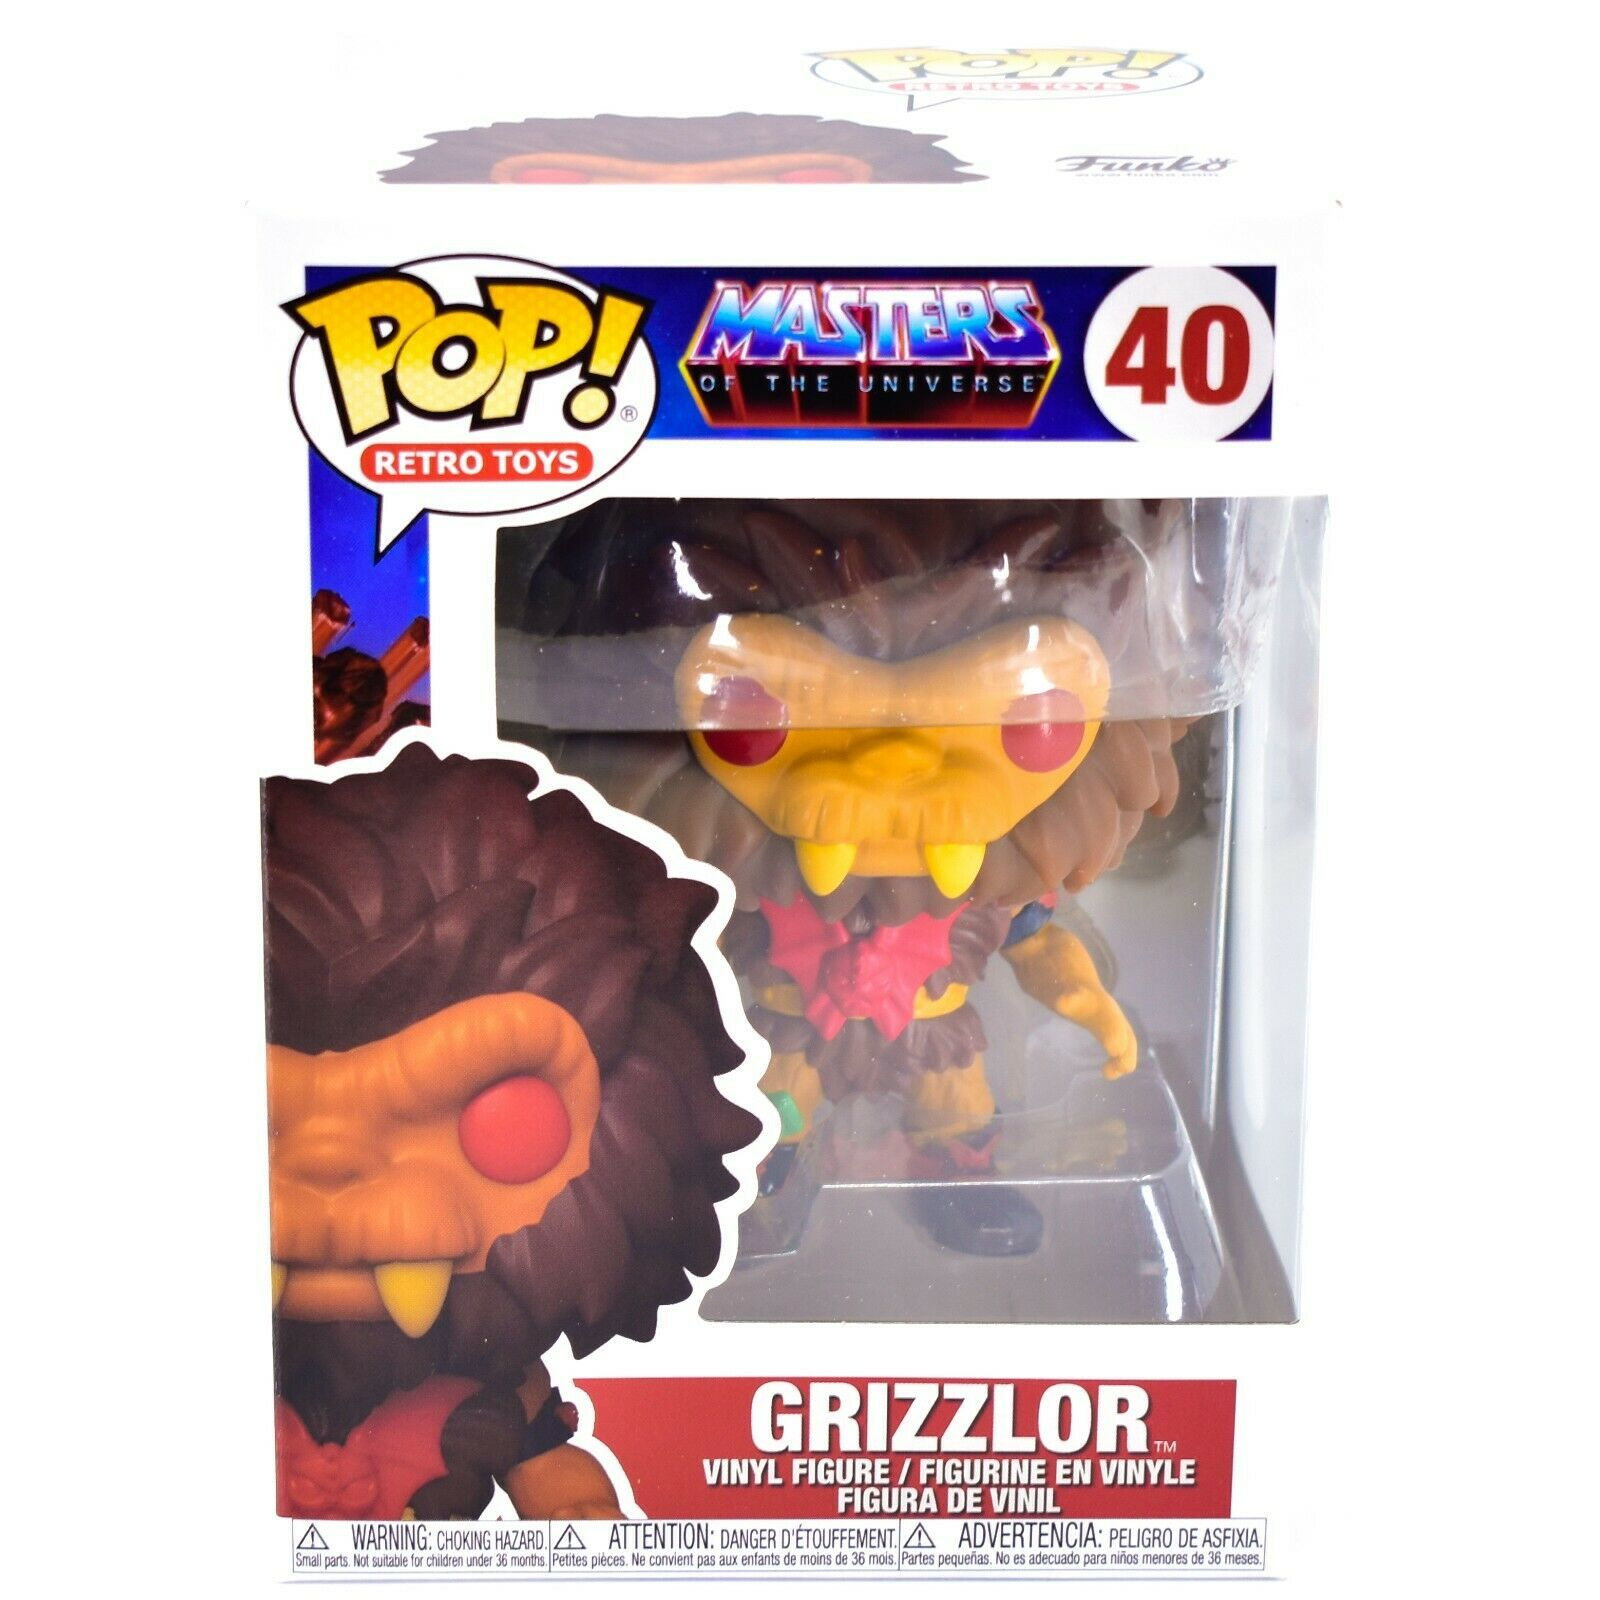 Funko Pop! Retro Toys Masters of the Universe MOTU Grizzlor #40 Vinyl Figure